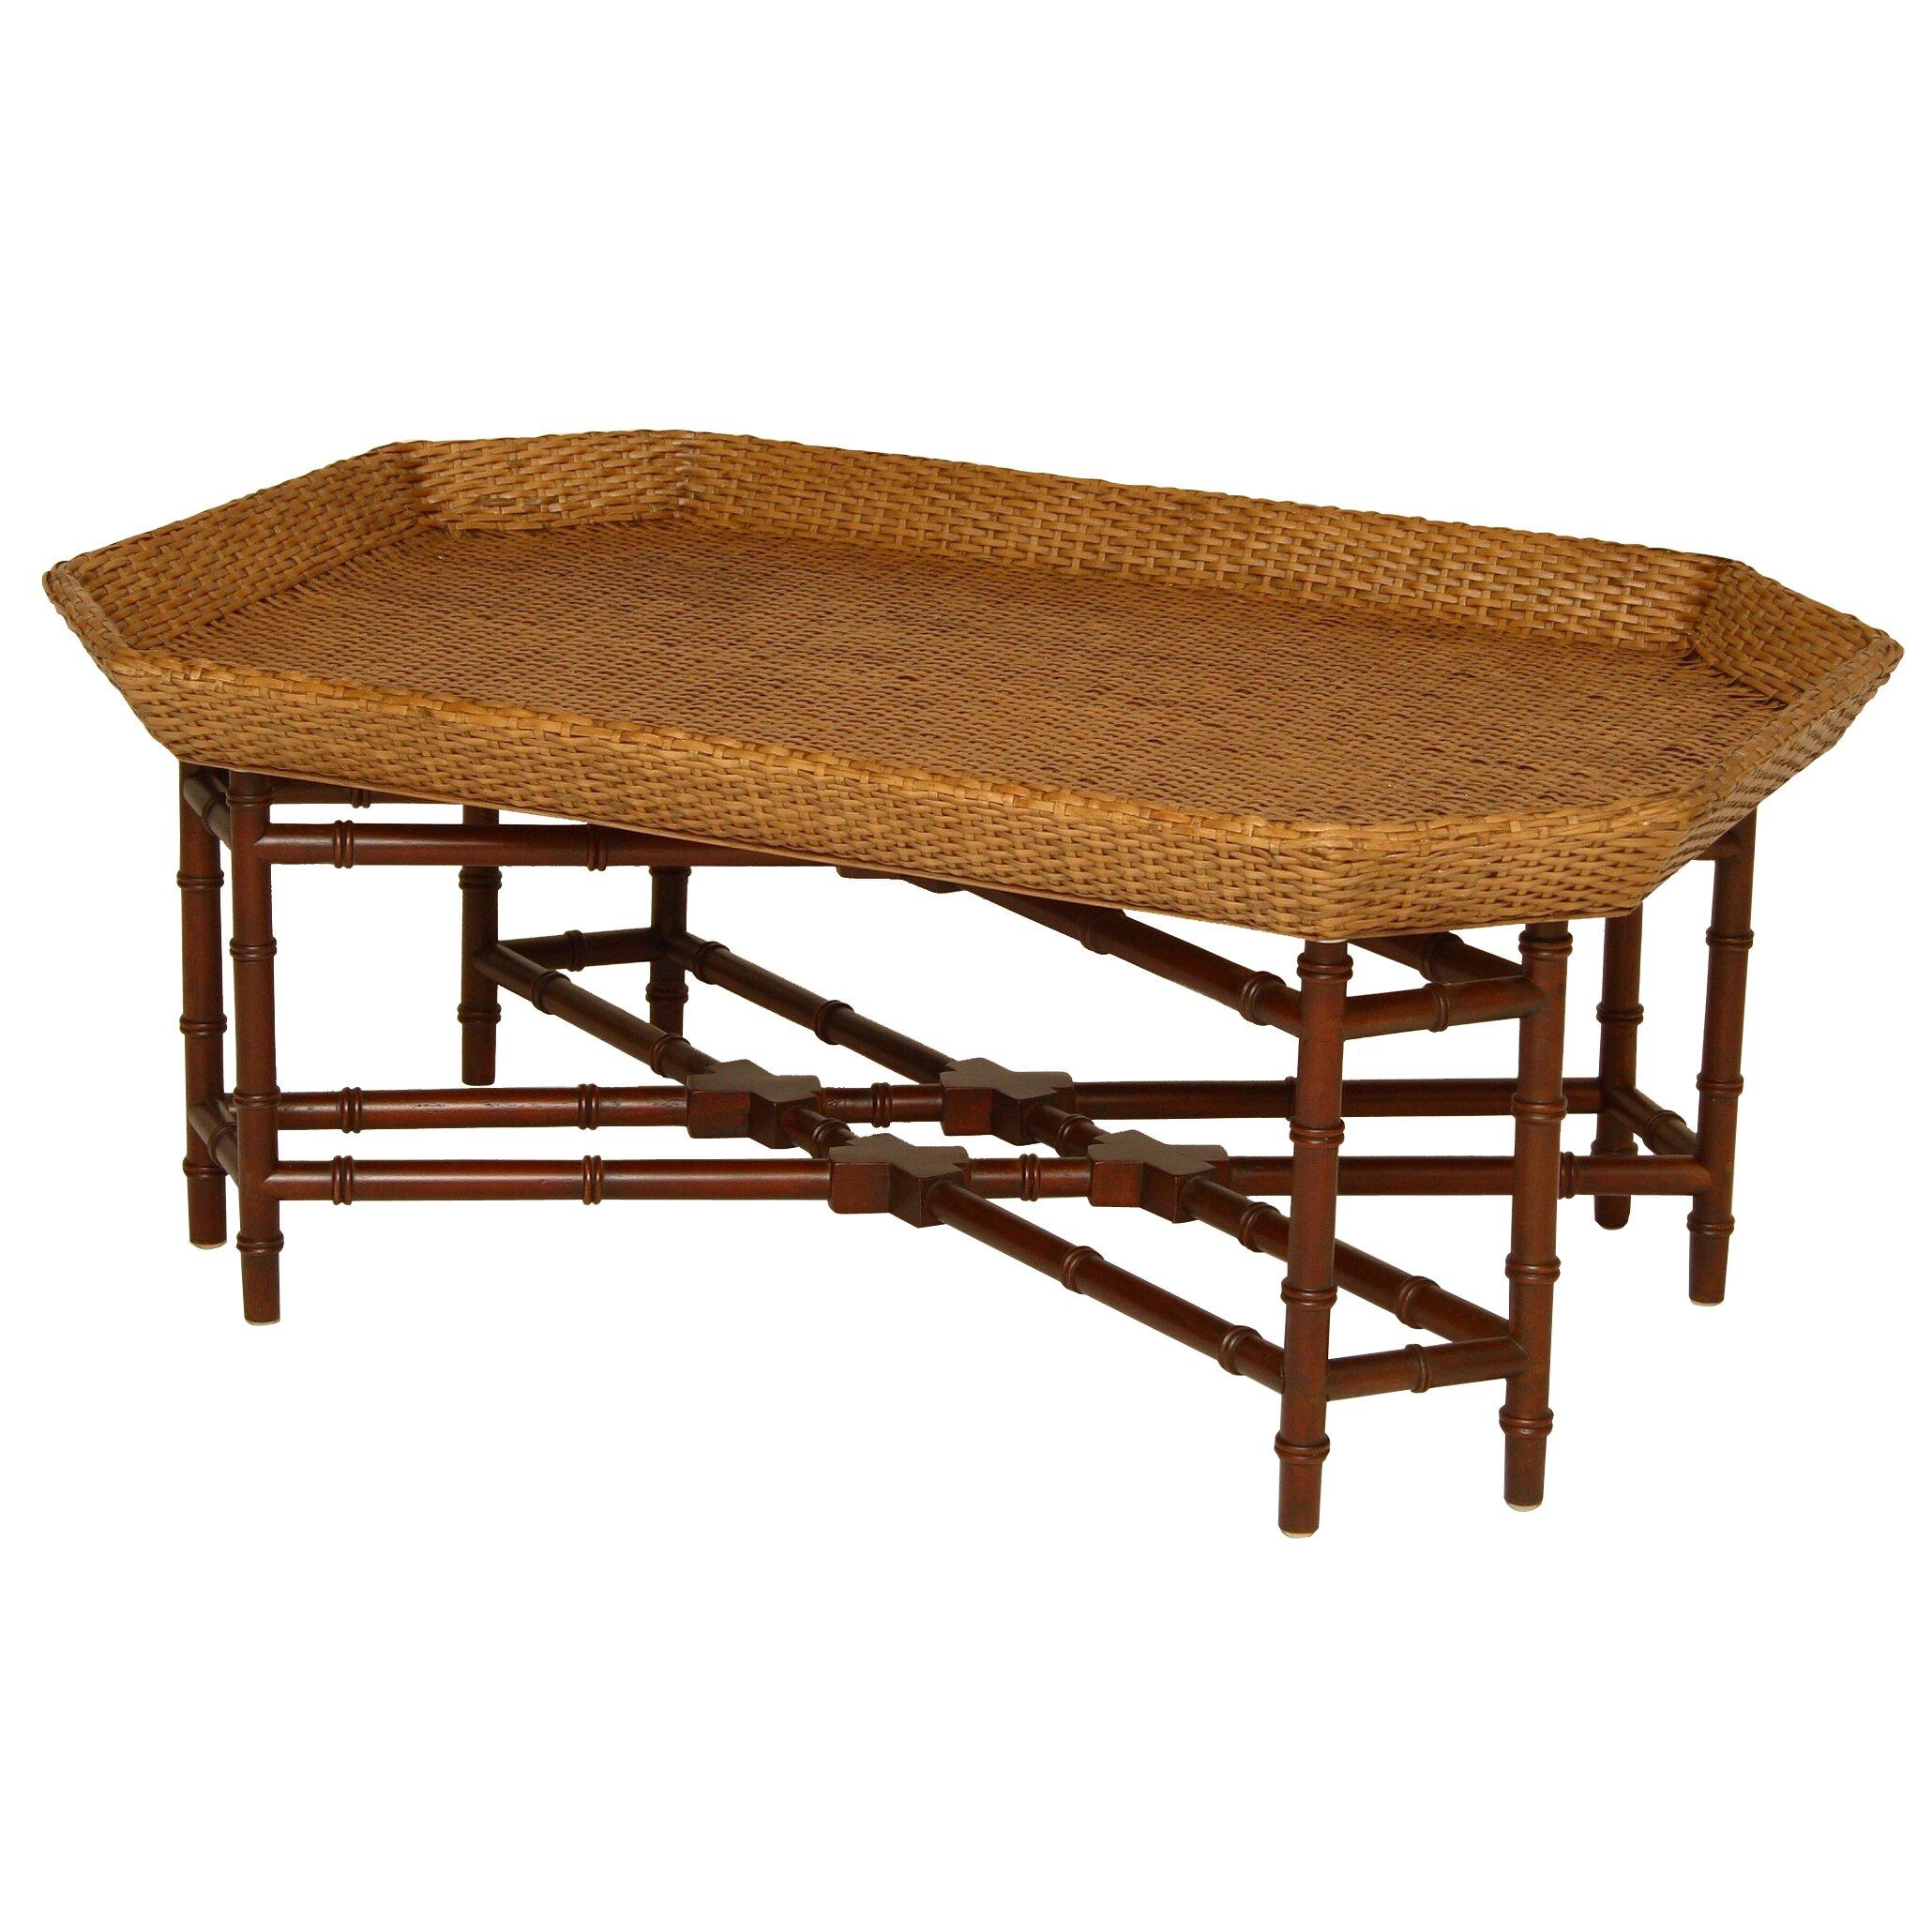 Padmas plantation urban coffee table reviews wayfair for Coffee table urban